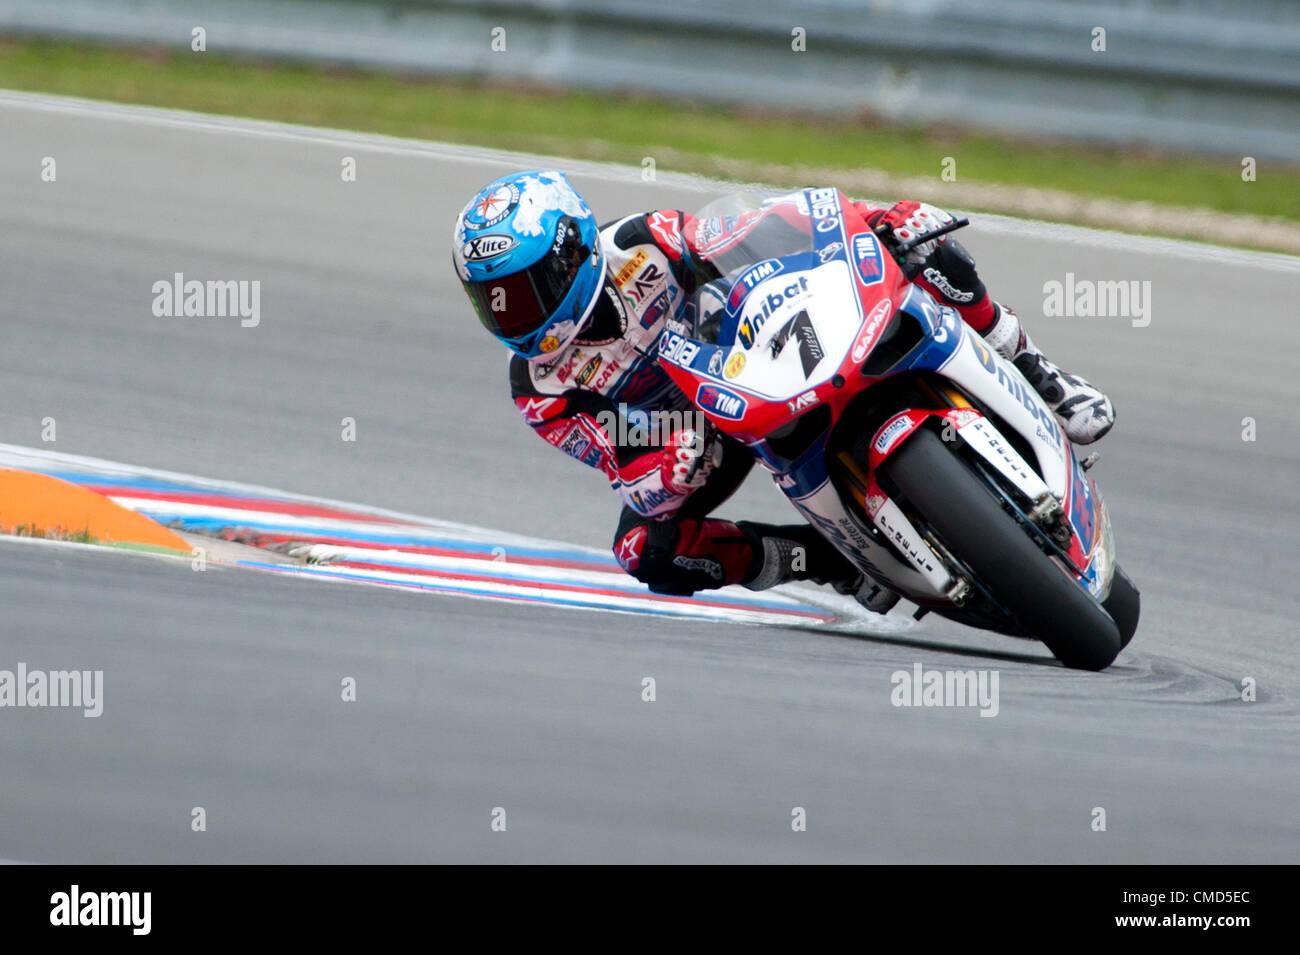 22.07.2012. Brno, Czech Republic.  7 Carlos Checa of Althea Racing Ducati 1098R  Brno Racetrack, Brno Czech Republic. Stock Photo